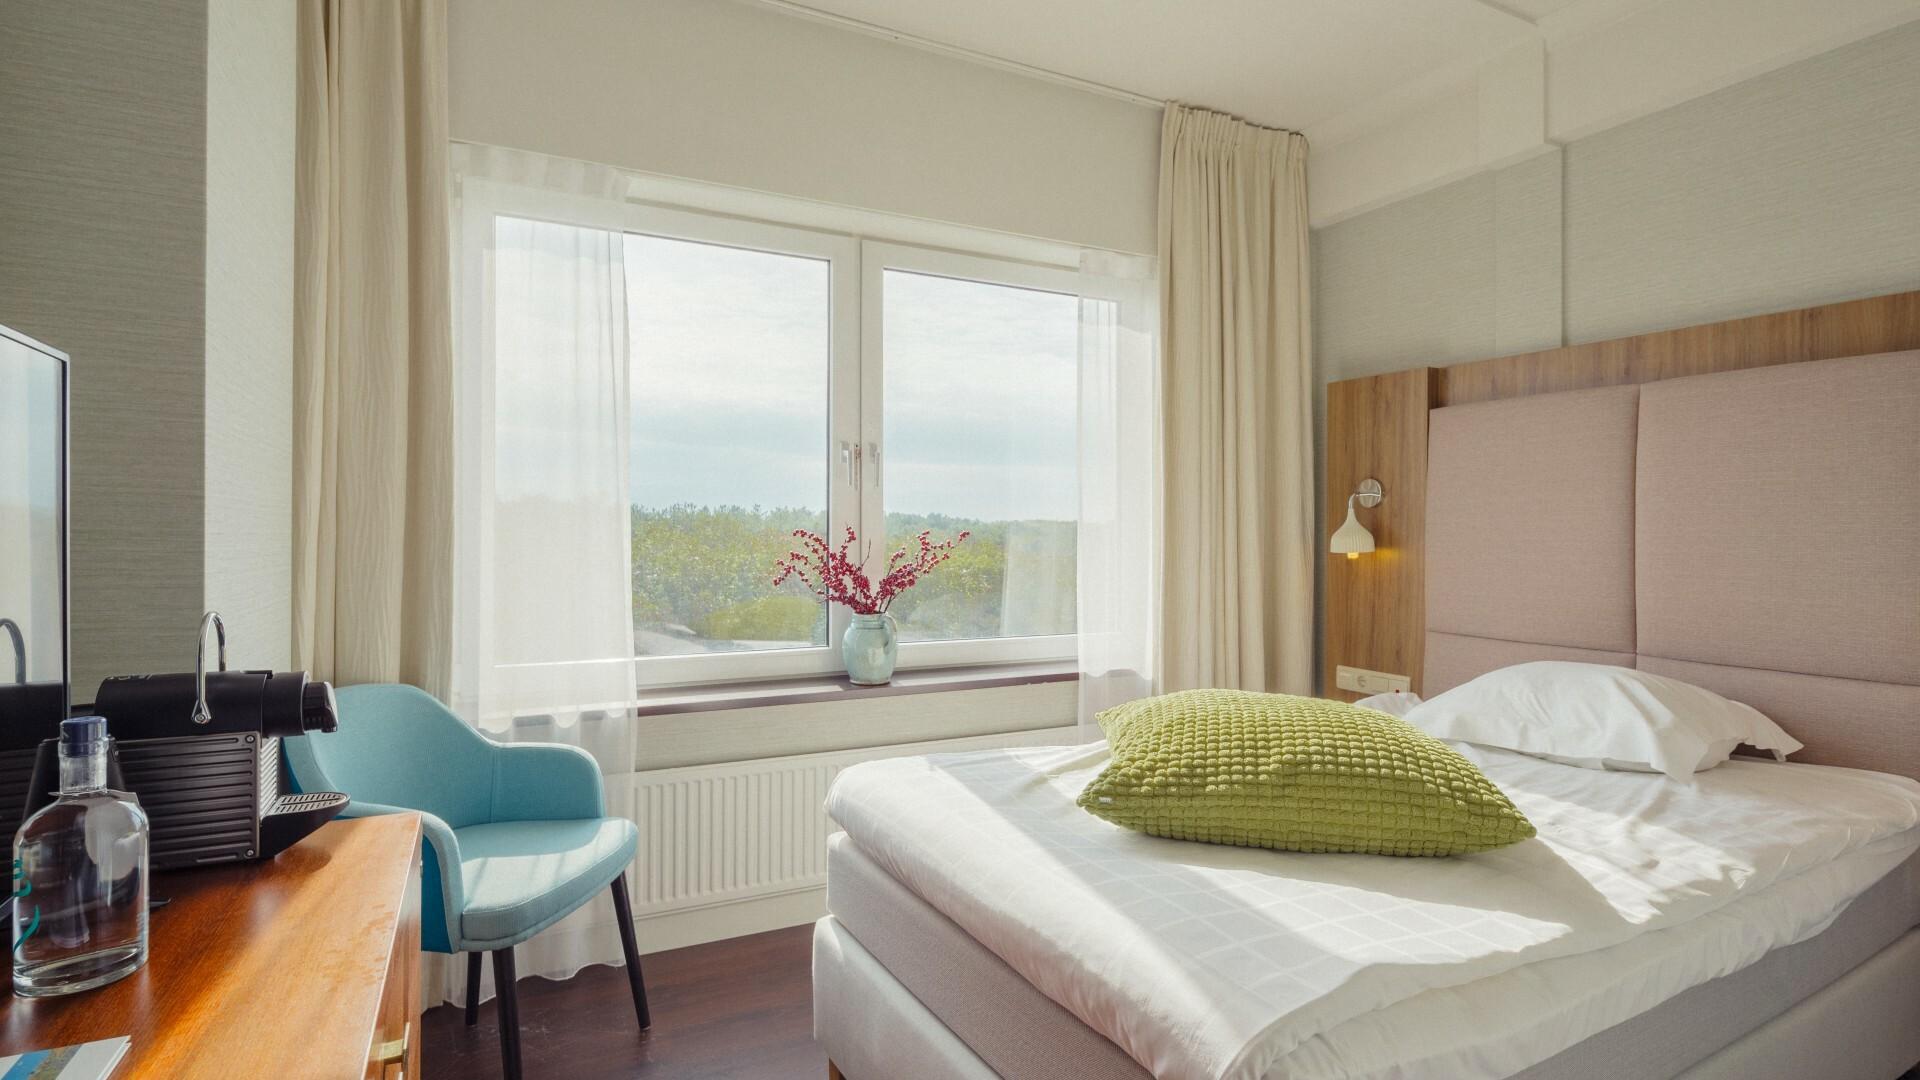 Hotelkamer Single Standard van Hotel Opduin VVV Texel